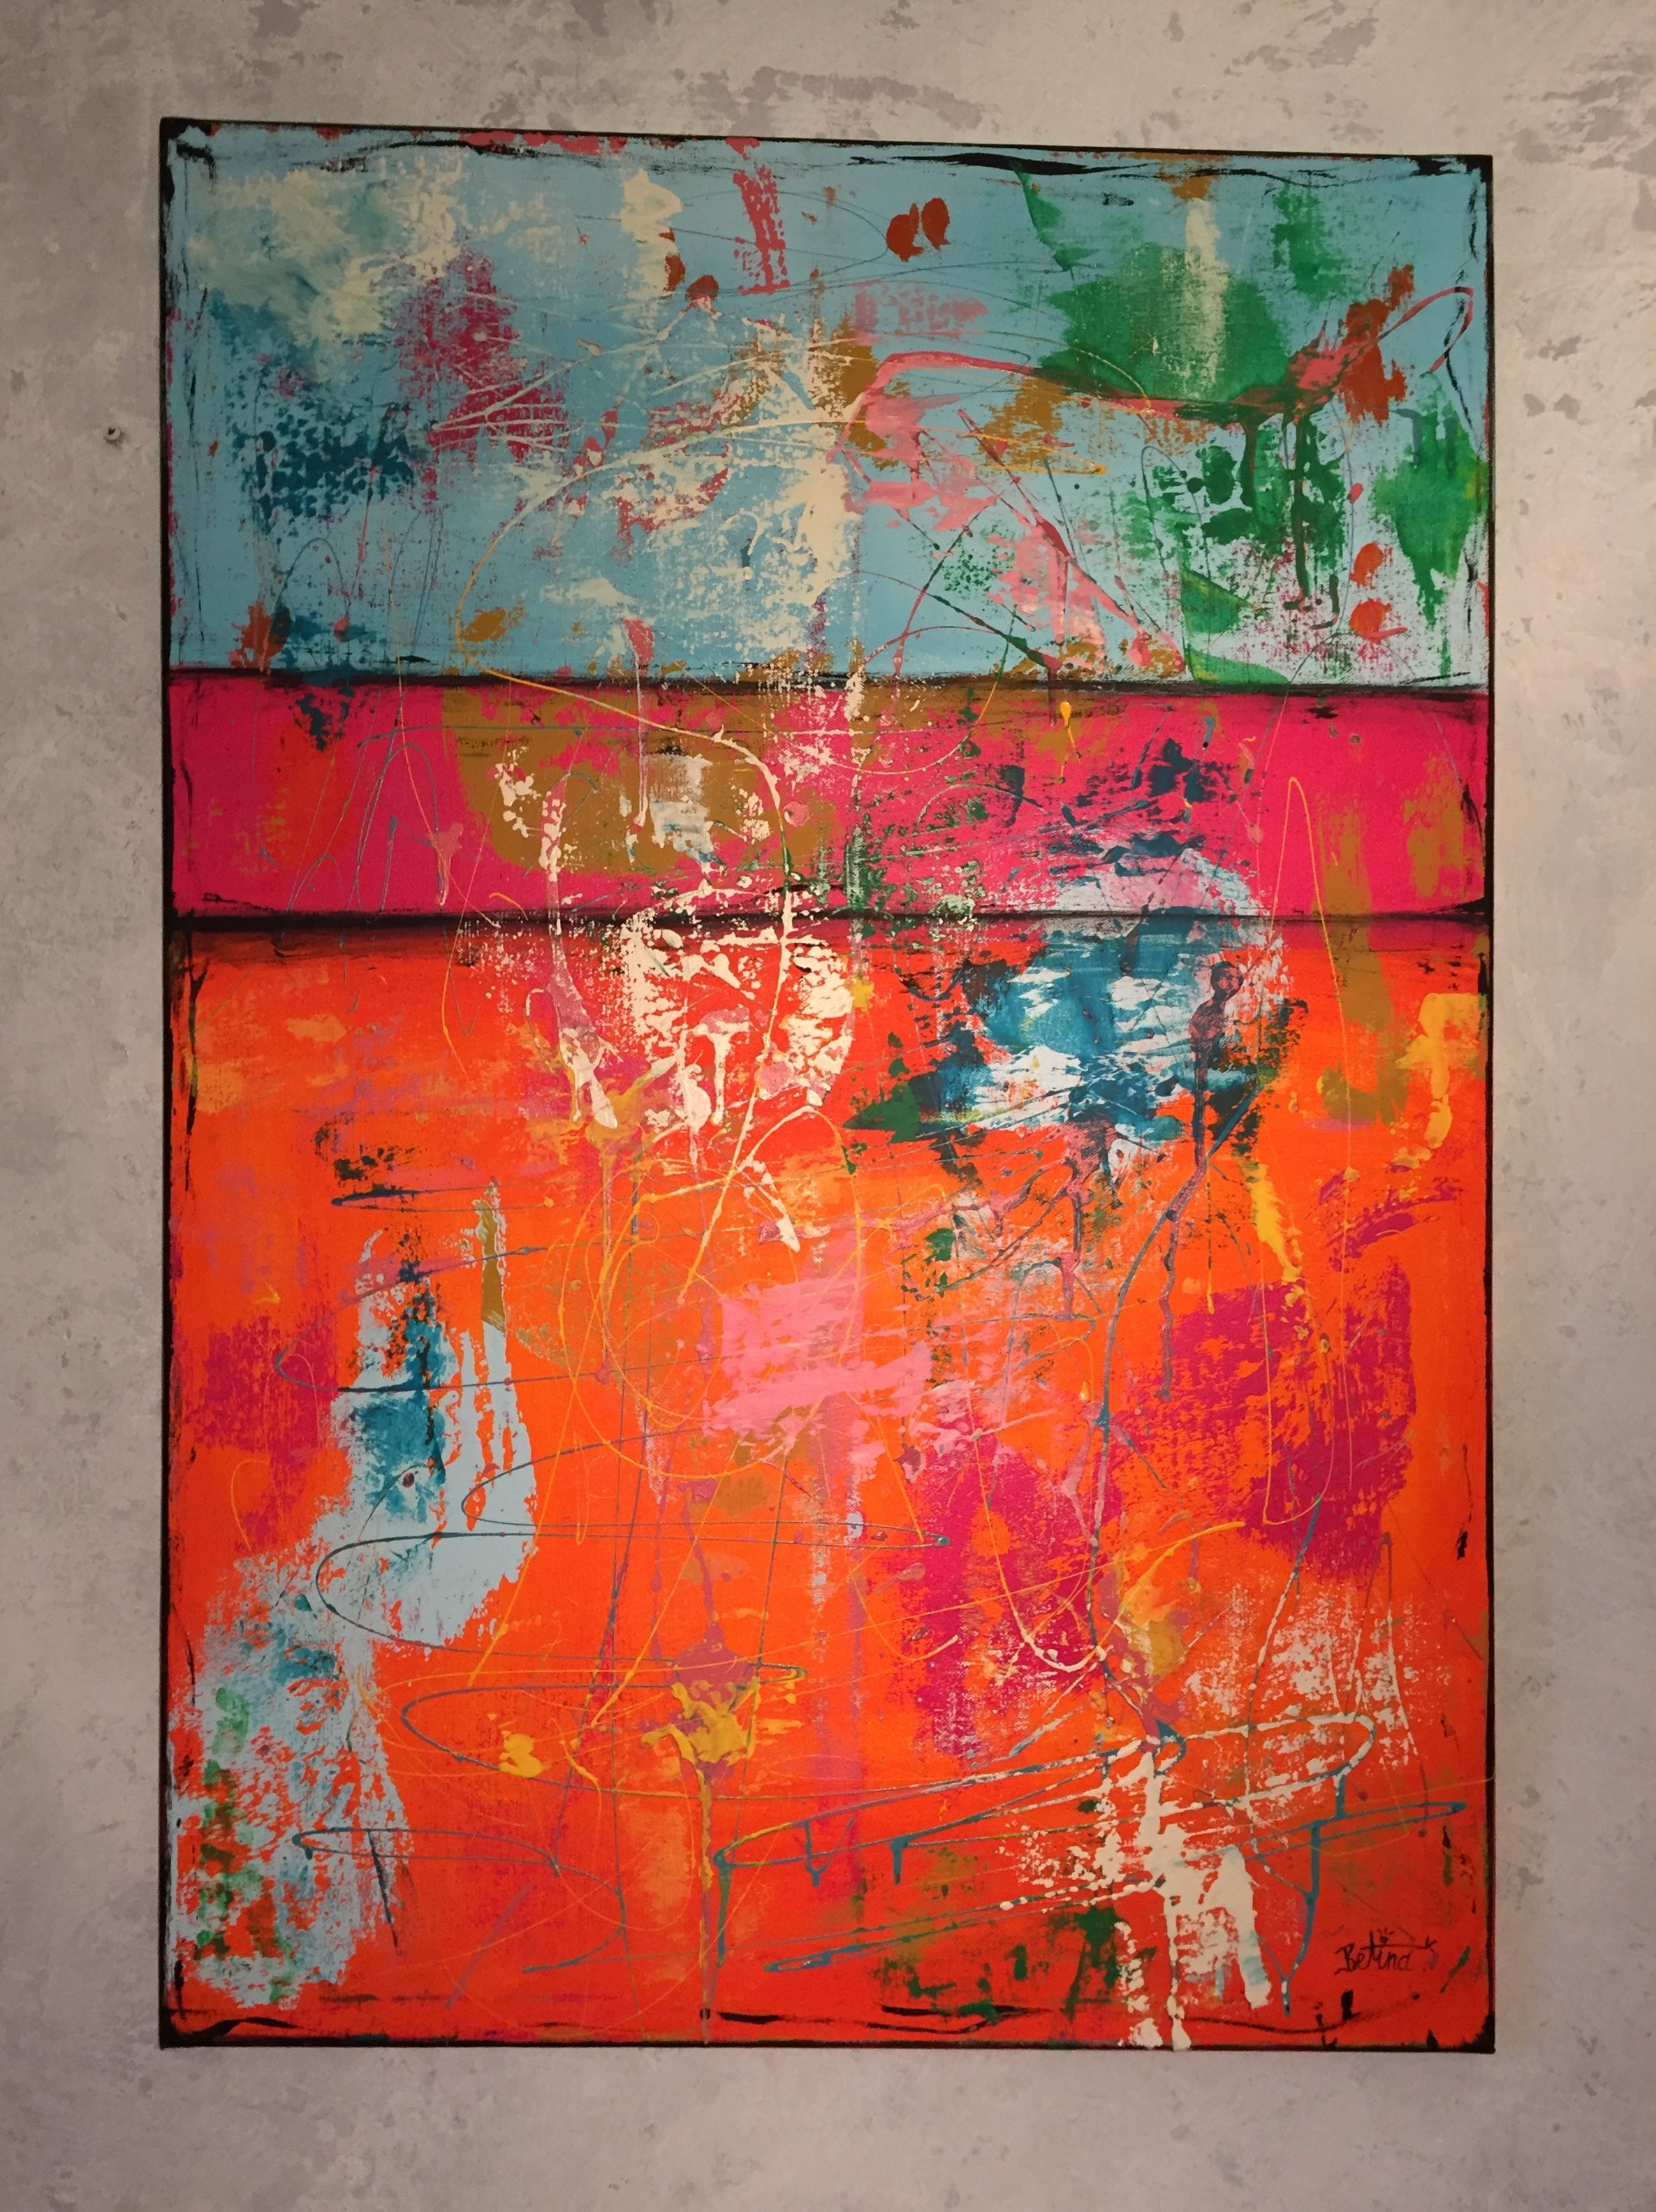 abstrakt malerei acryl auf leinwand 80x100 abstrakte acrylmalerei portraits künstler antje hettner bilder kaufen